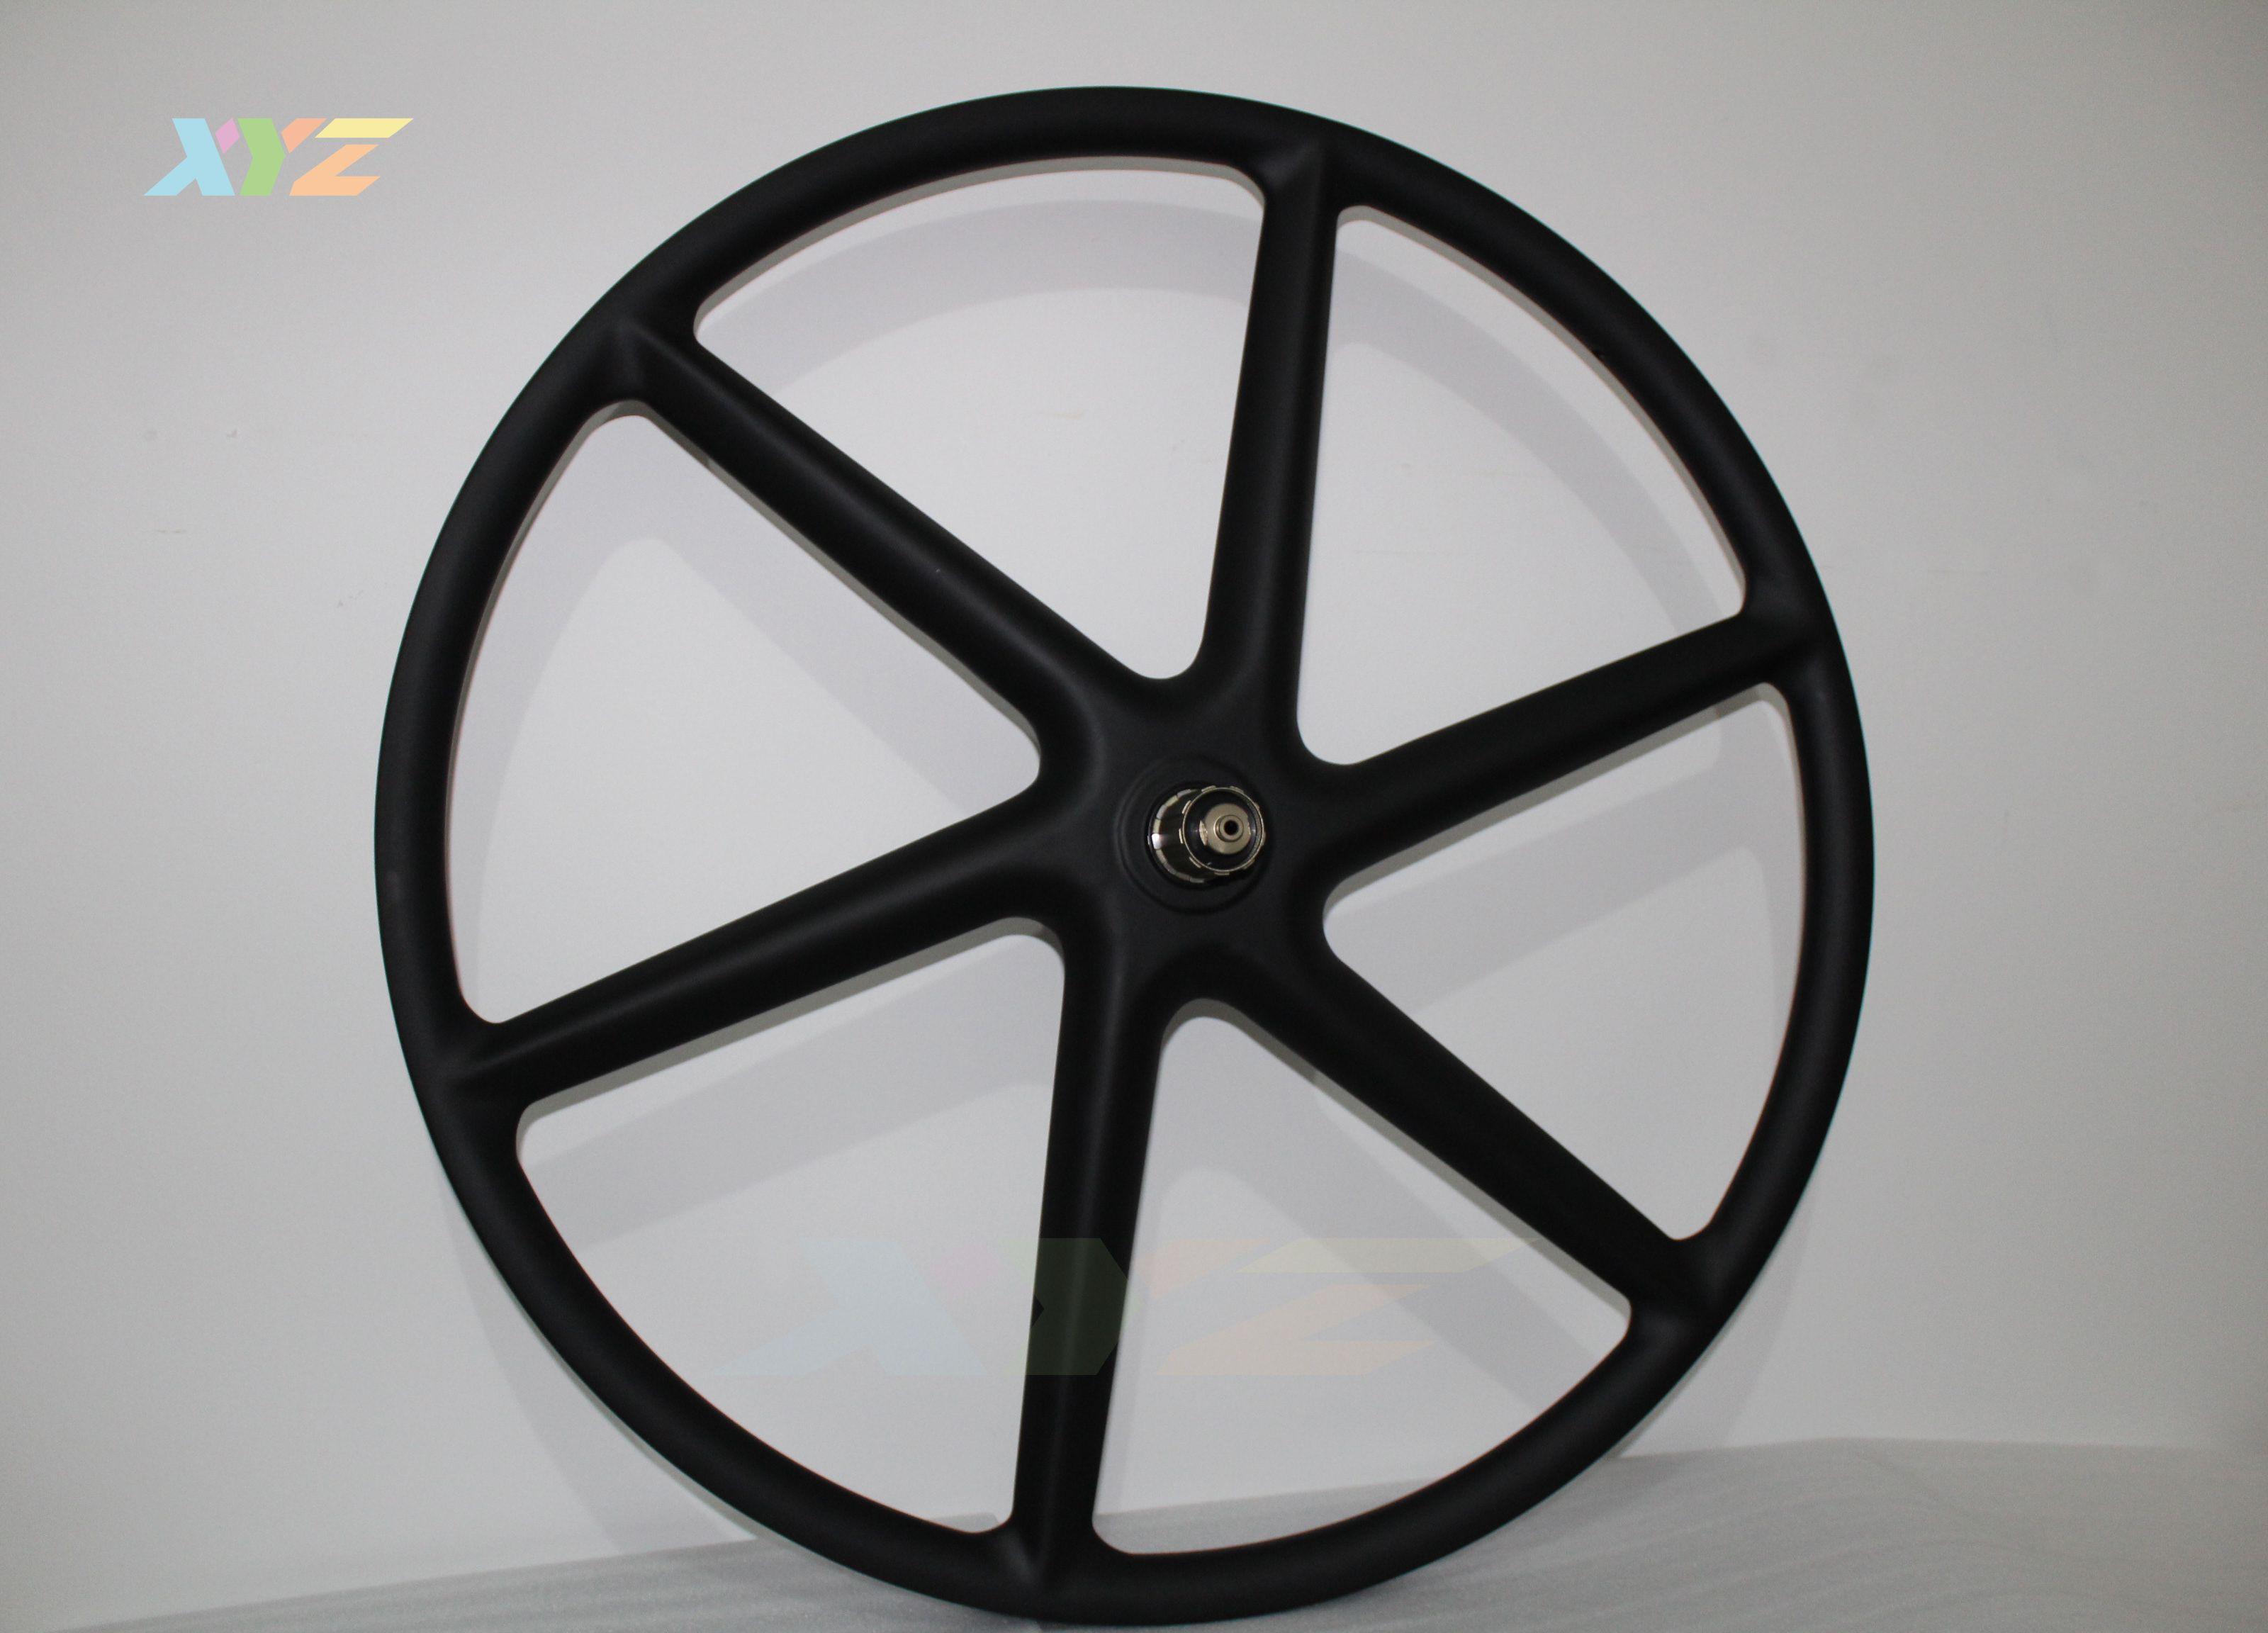 New 29 Inch Stiff 6 Spoke Monocoque Design Mtb Carbon Tubeless